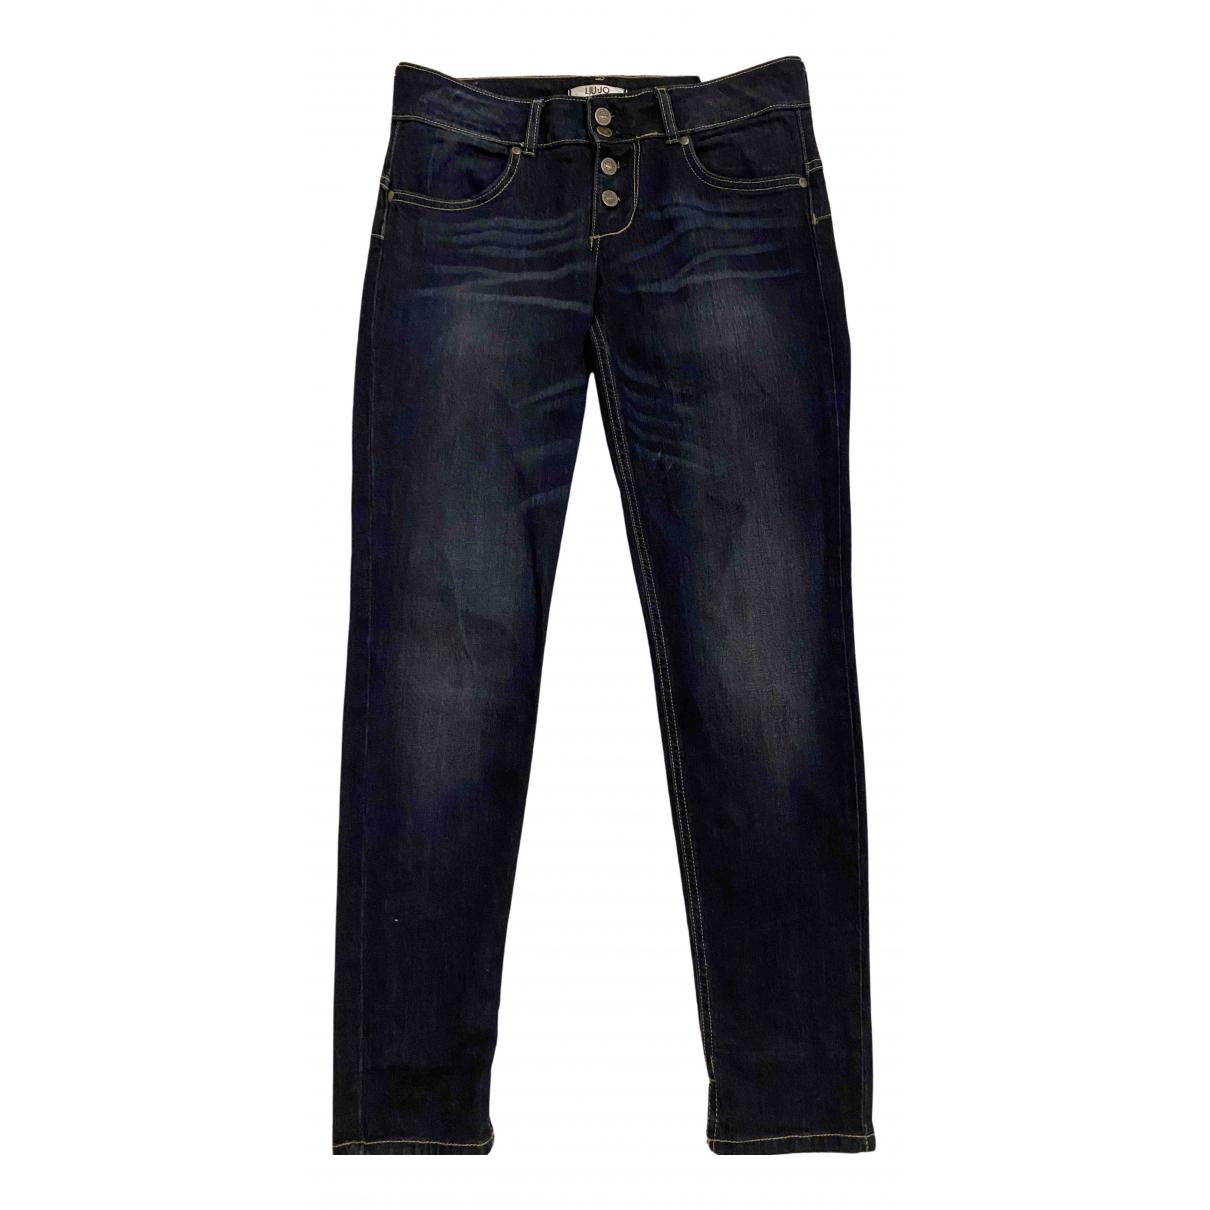 Liu.jo N Blue Cotton - elasthane Jeans for Women 28 US